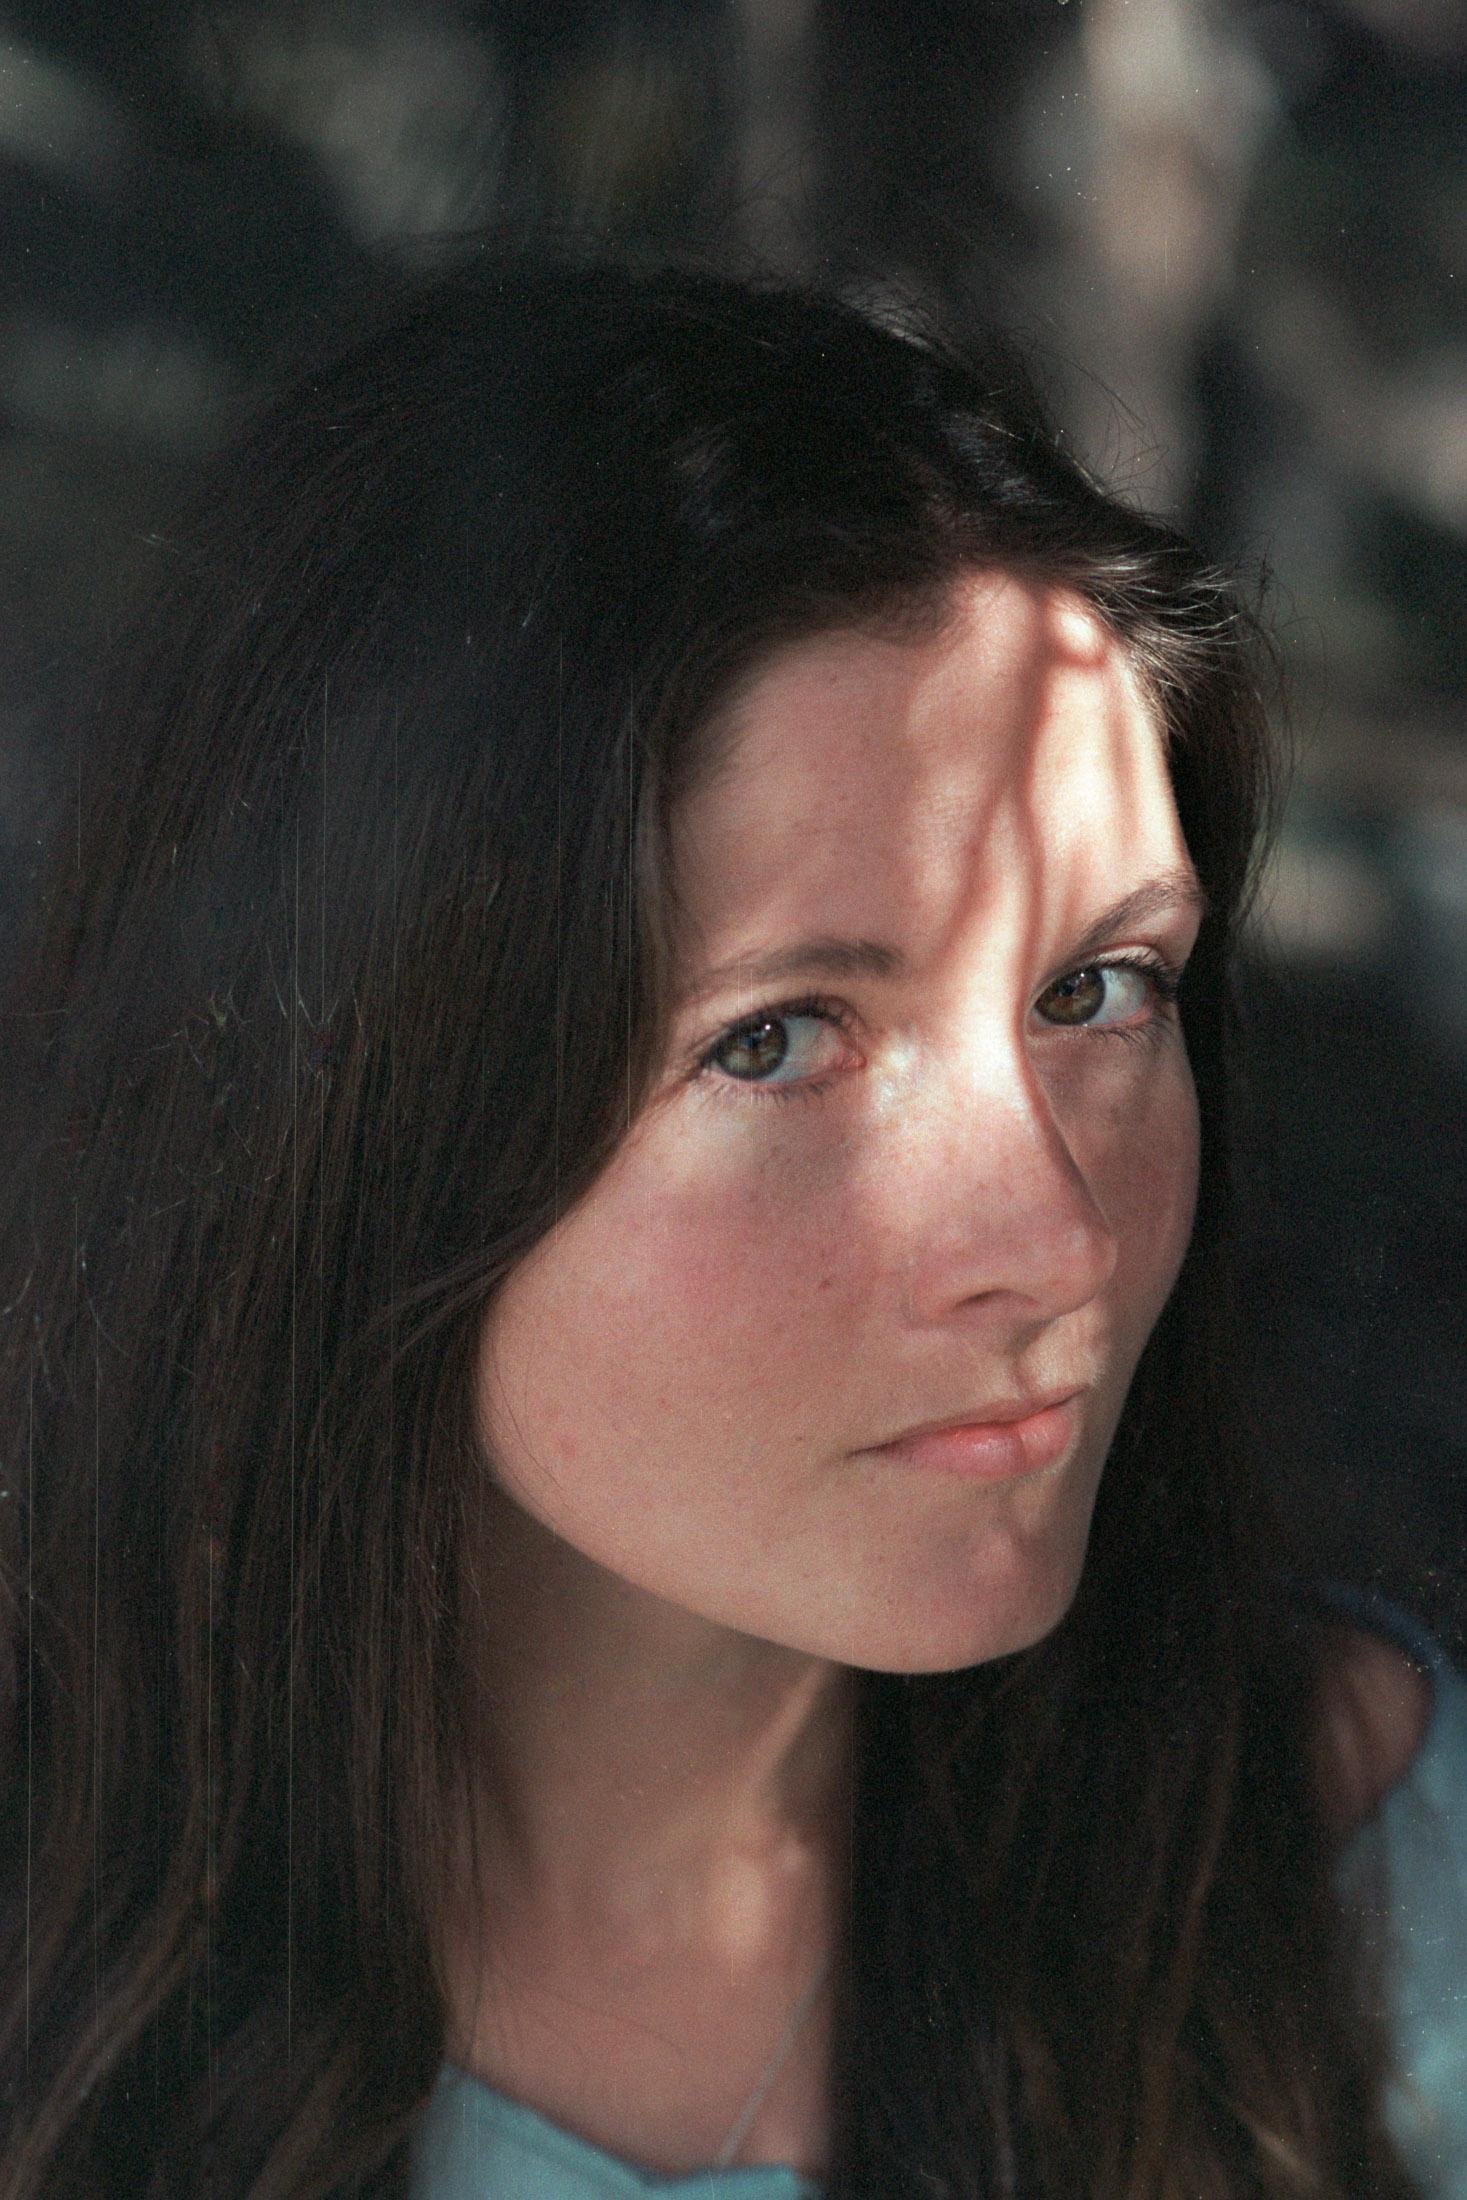 034-mickey-ross-portrait-photographer.JPG